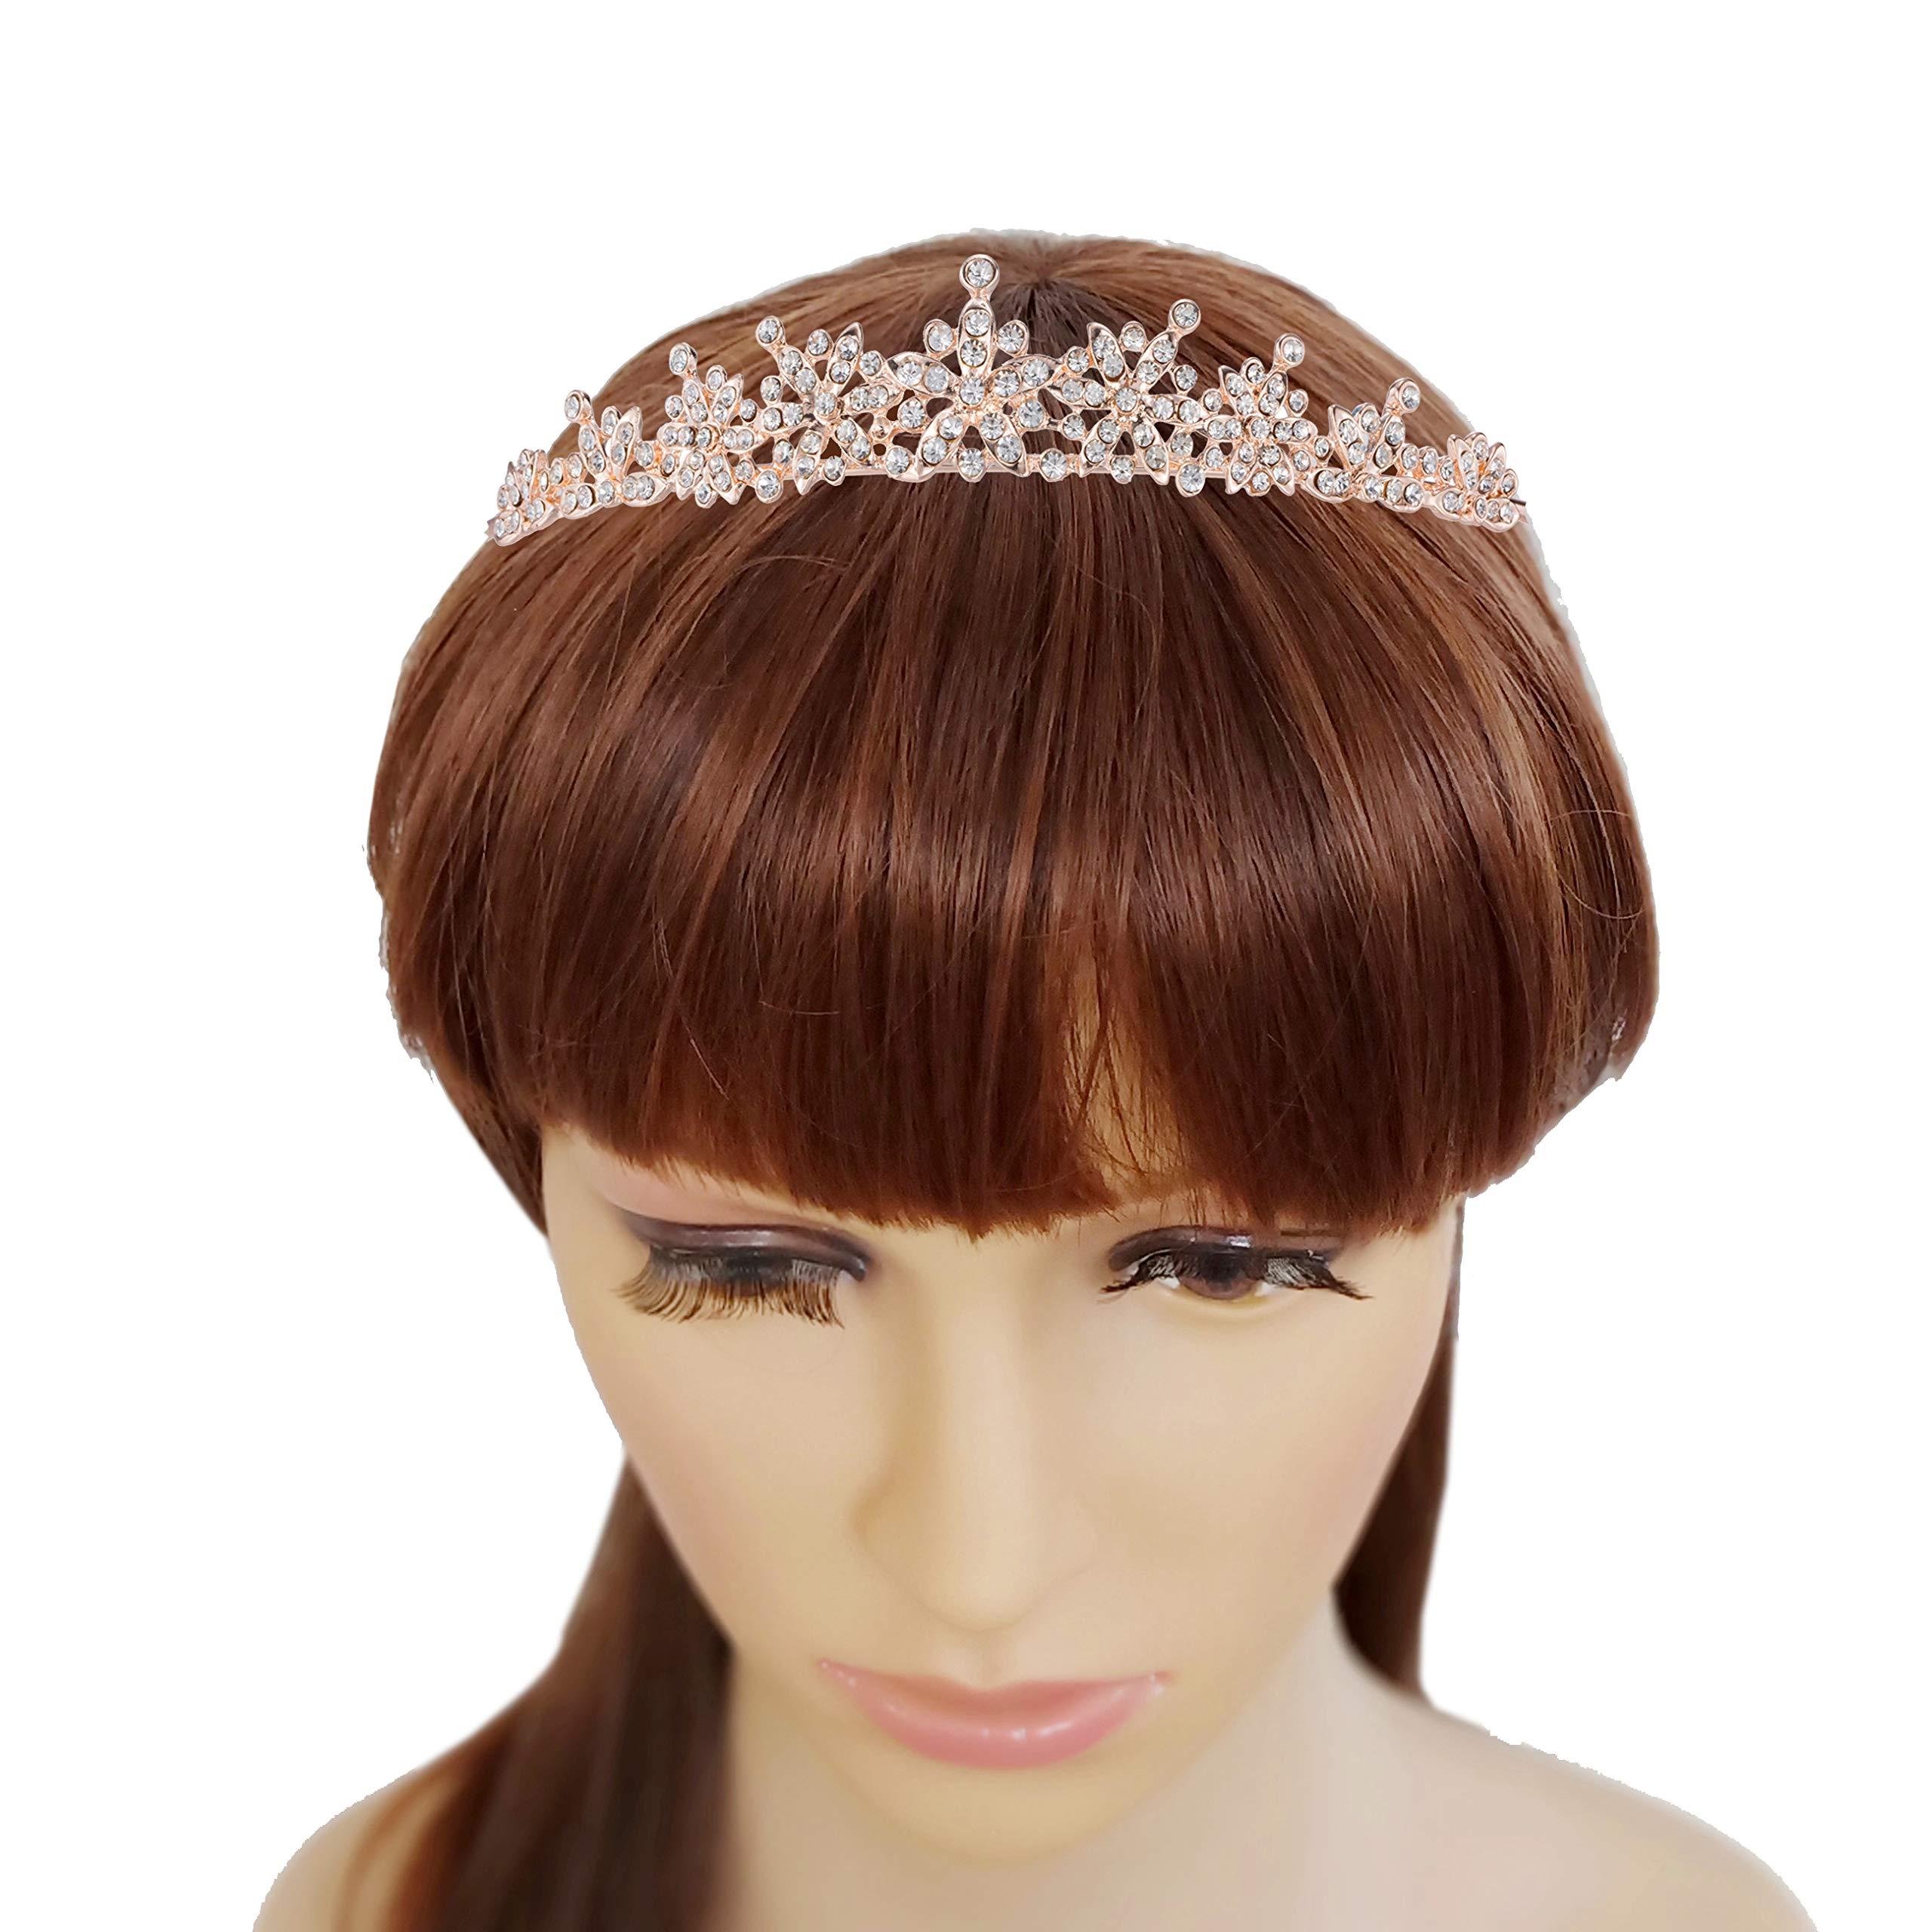 Amazon Sweetv Crystal Wedding Tiara For Bride Princess Tiara